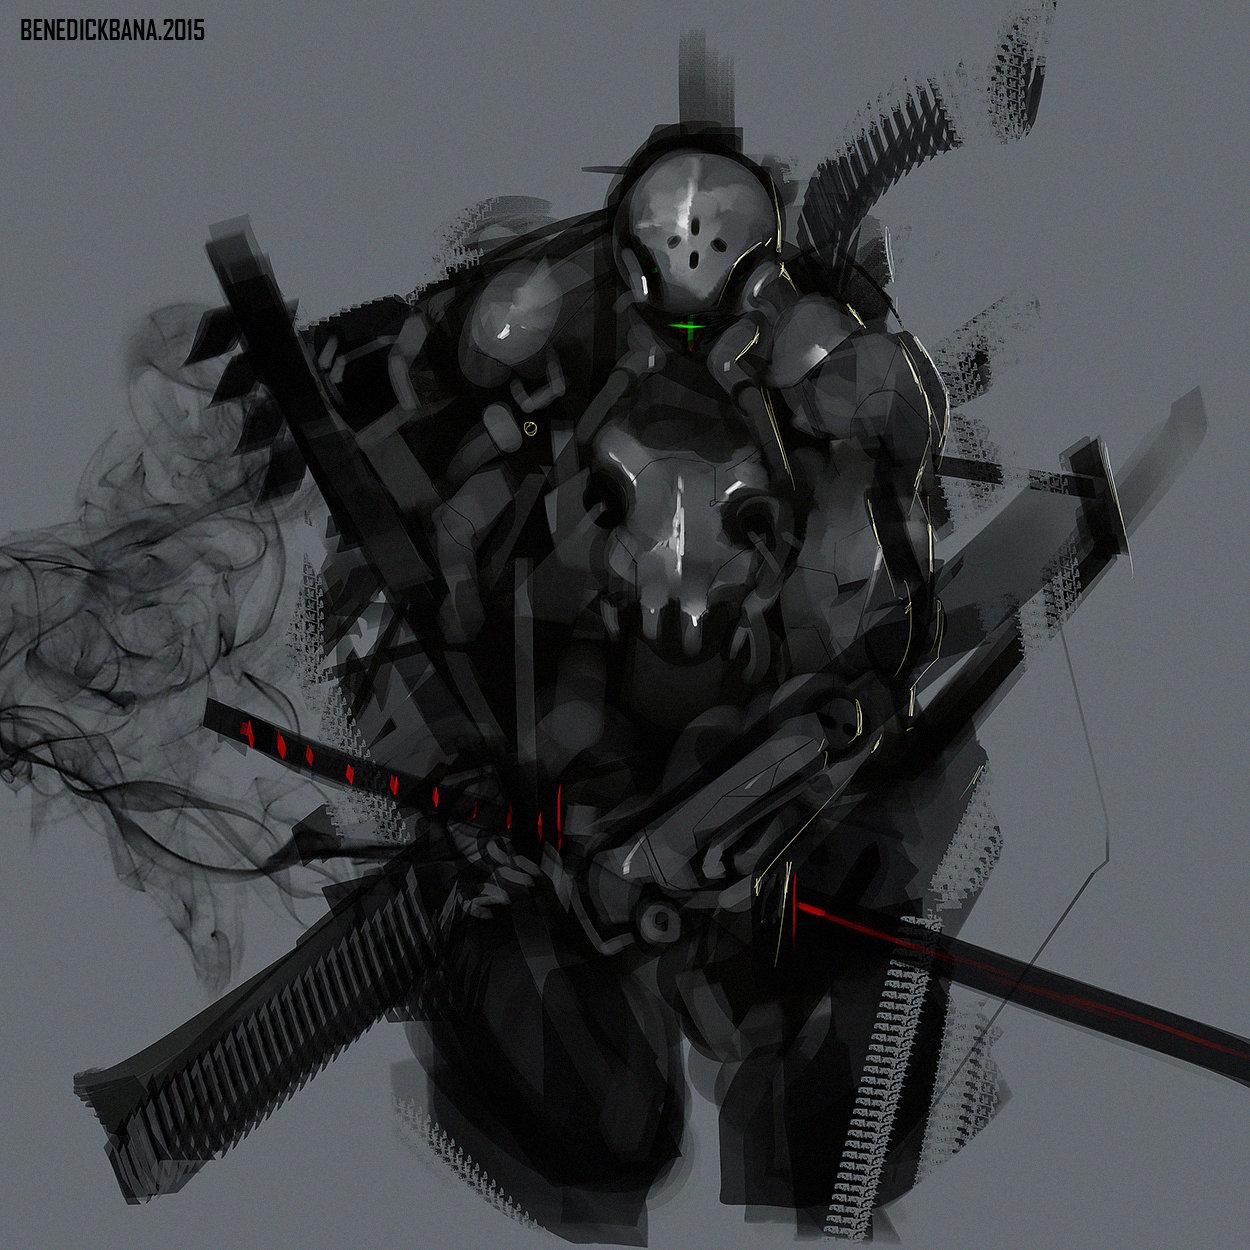 Benedick bana death squad lores